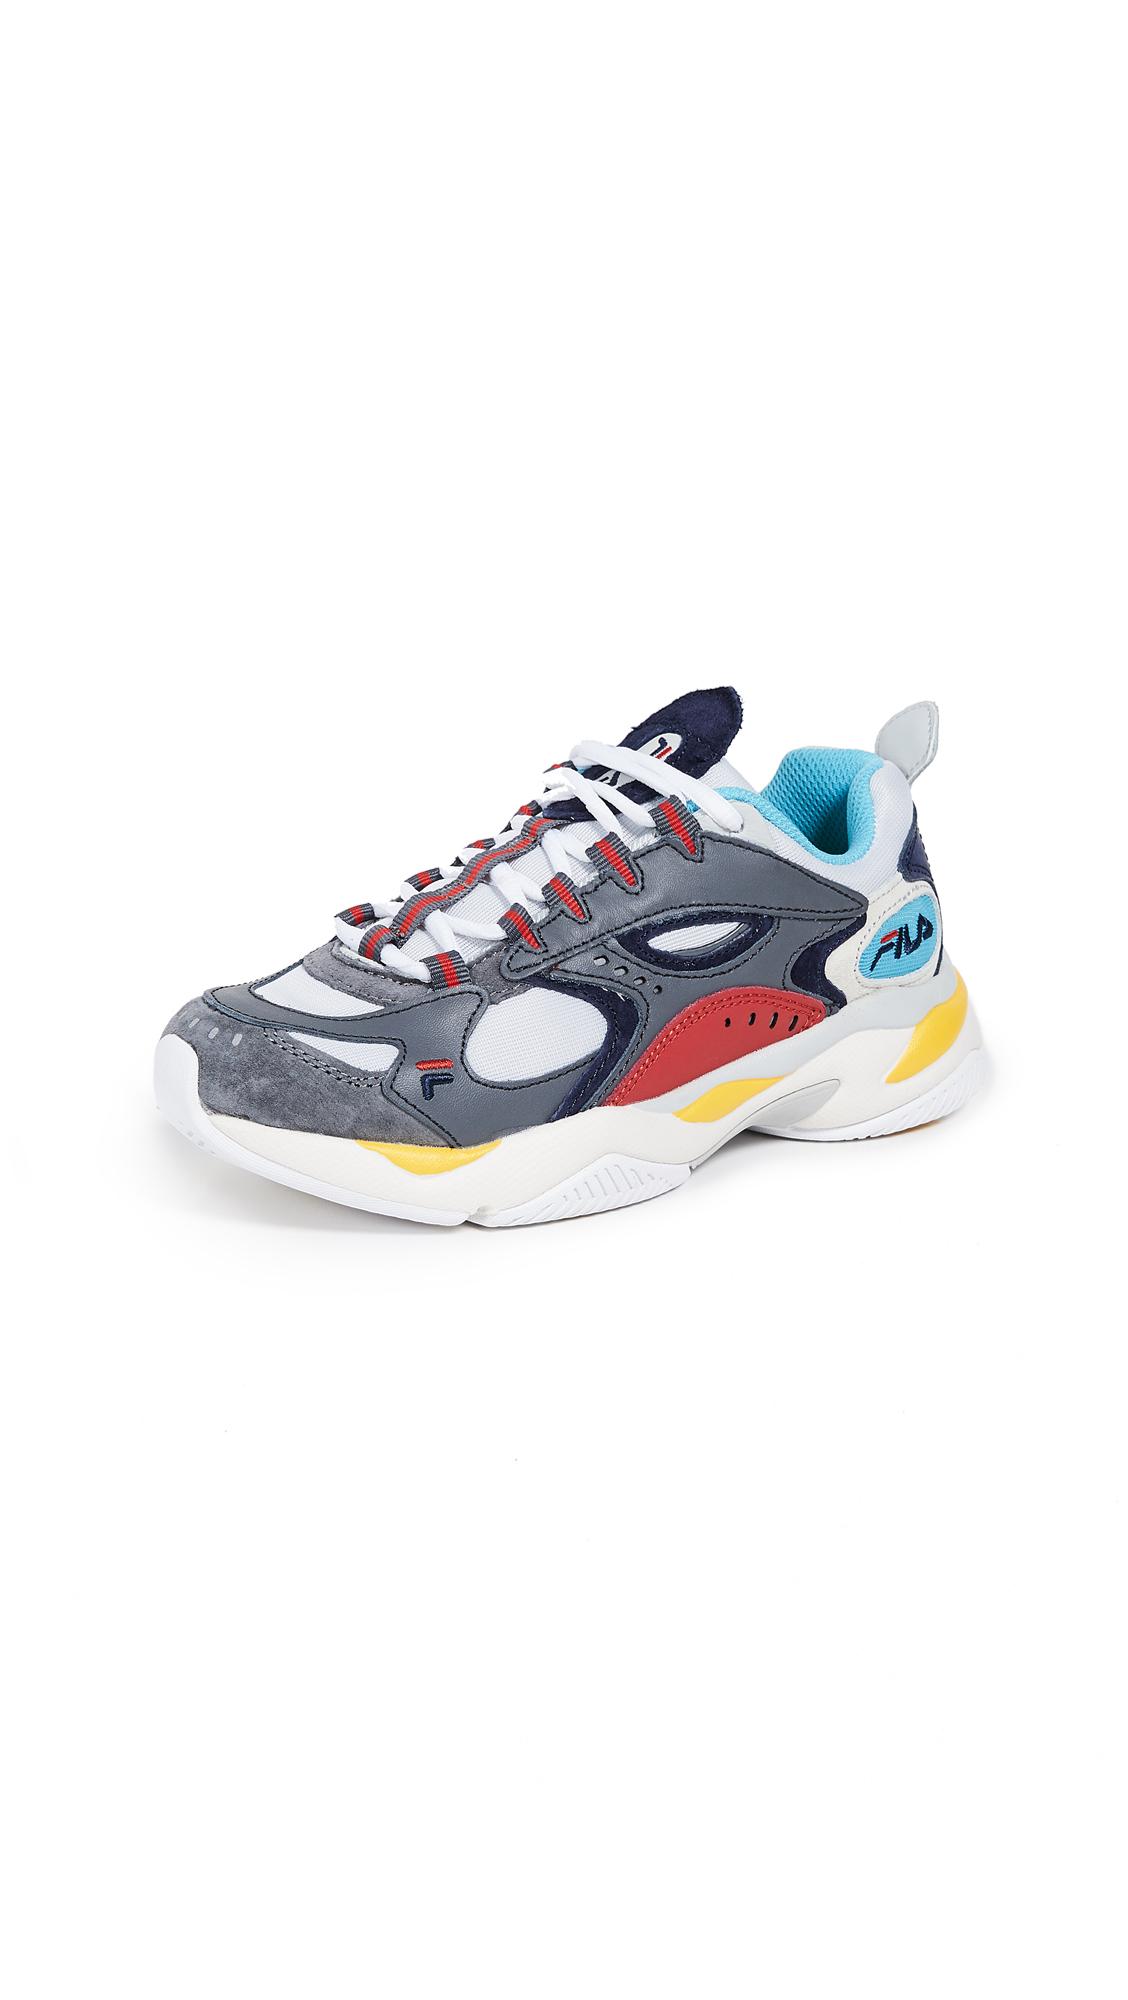 Fila Boveasorus Sneakers - Castlerock/Vapor Blue/Fila Red